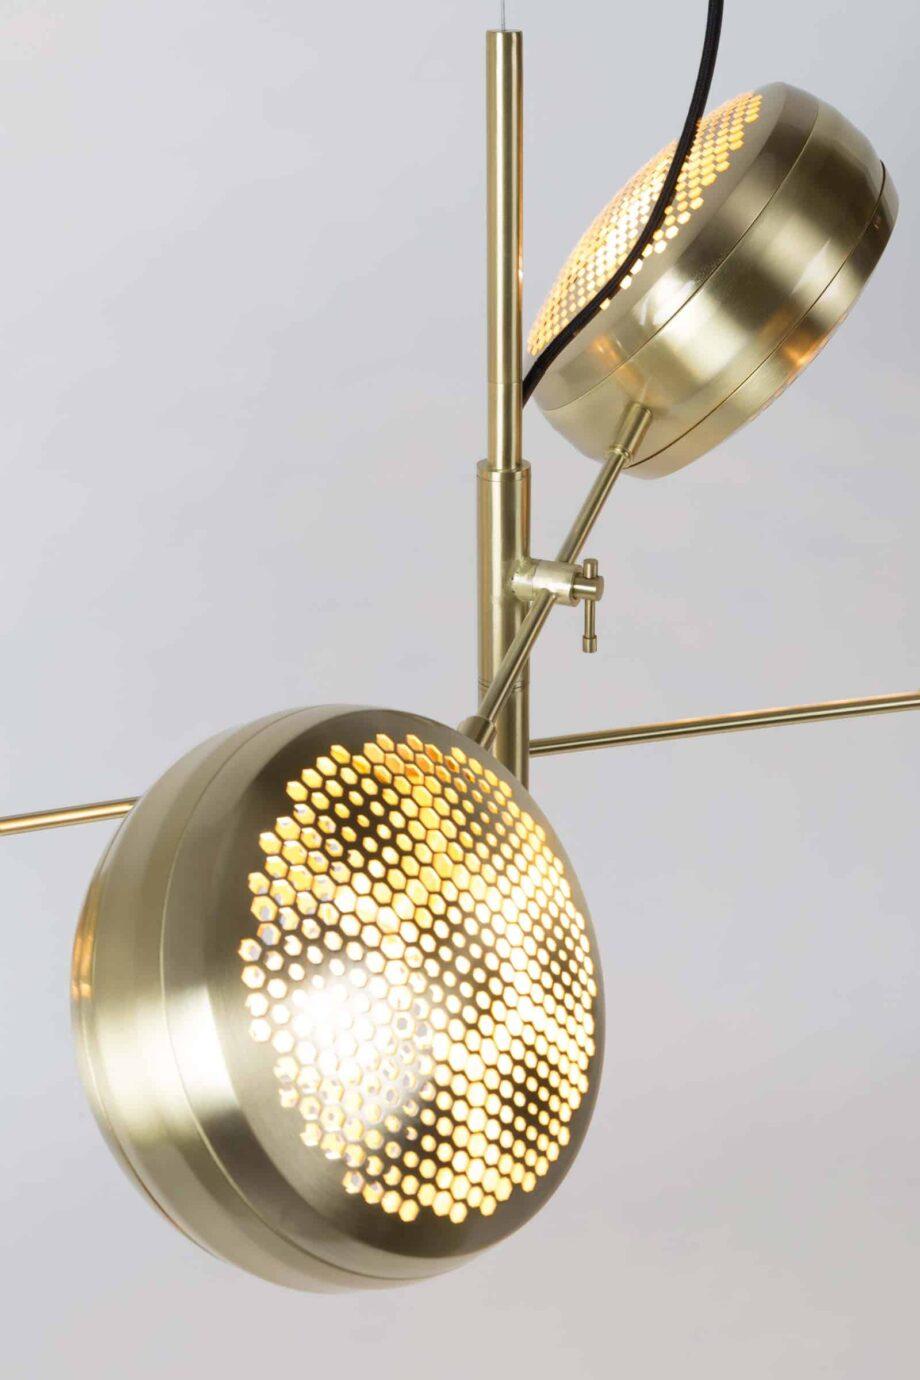 Gringo multi hanglamp Zuiver volledig goudkleur